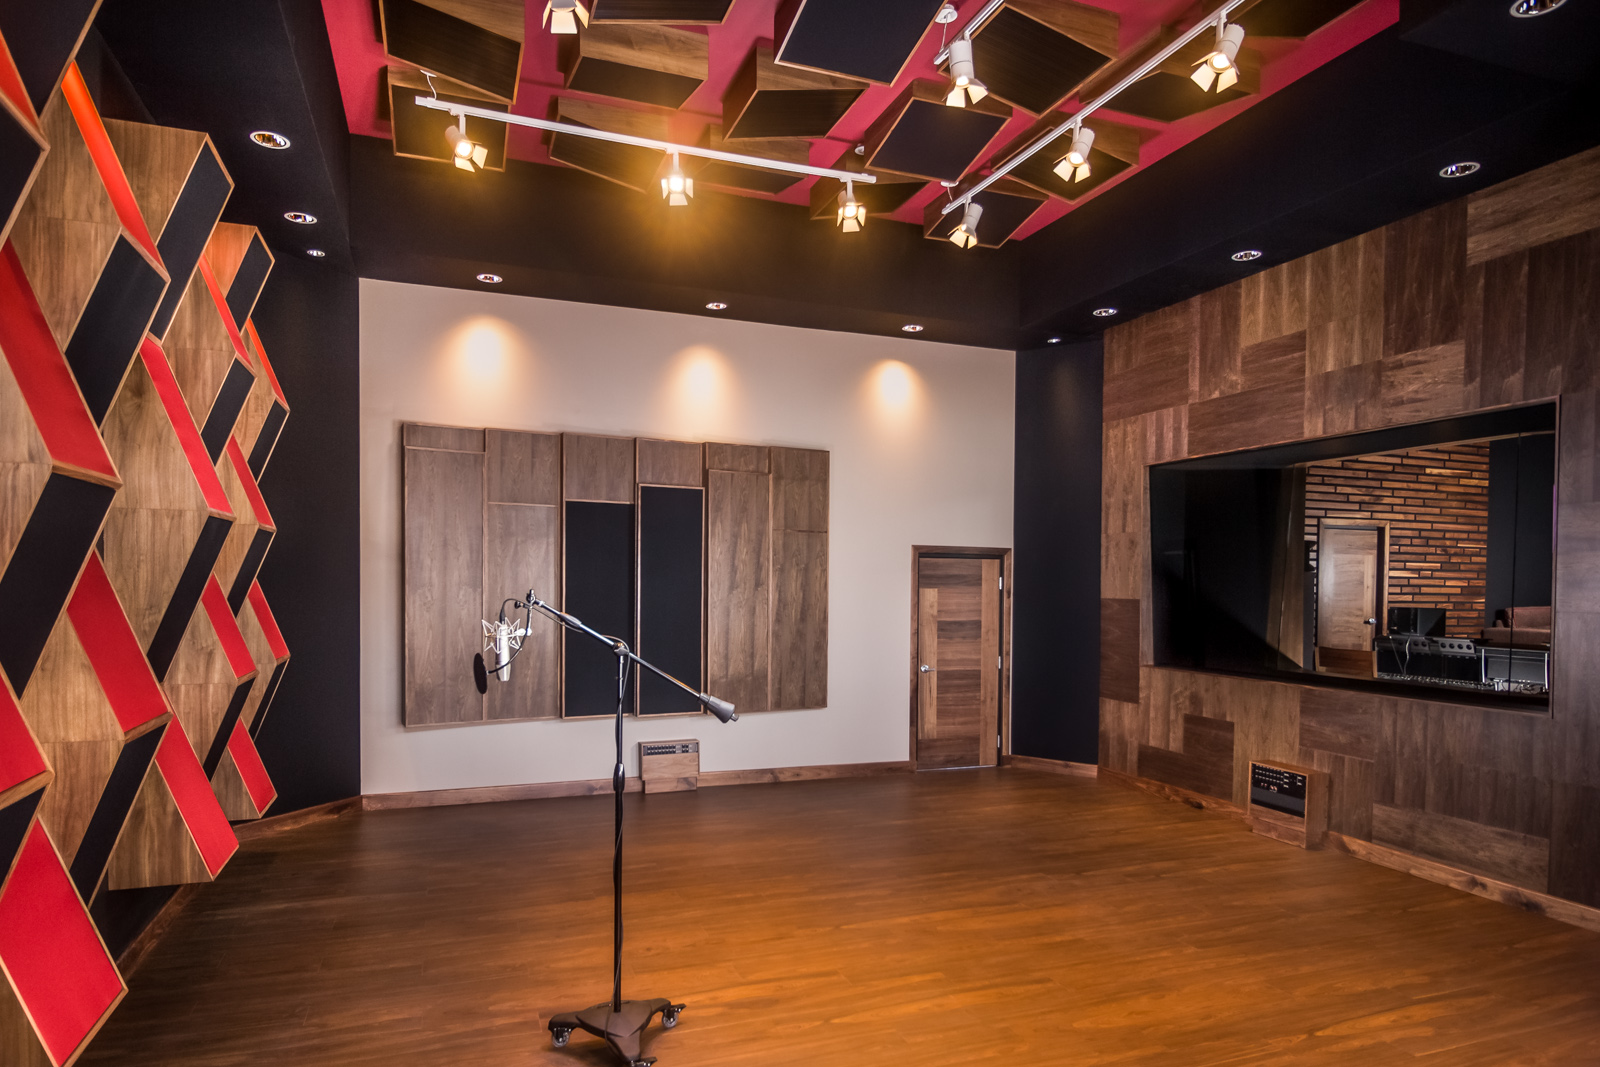 ESPI Studios in partnership with Malvicino Design Group